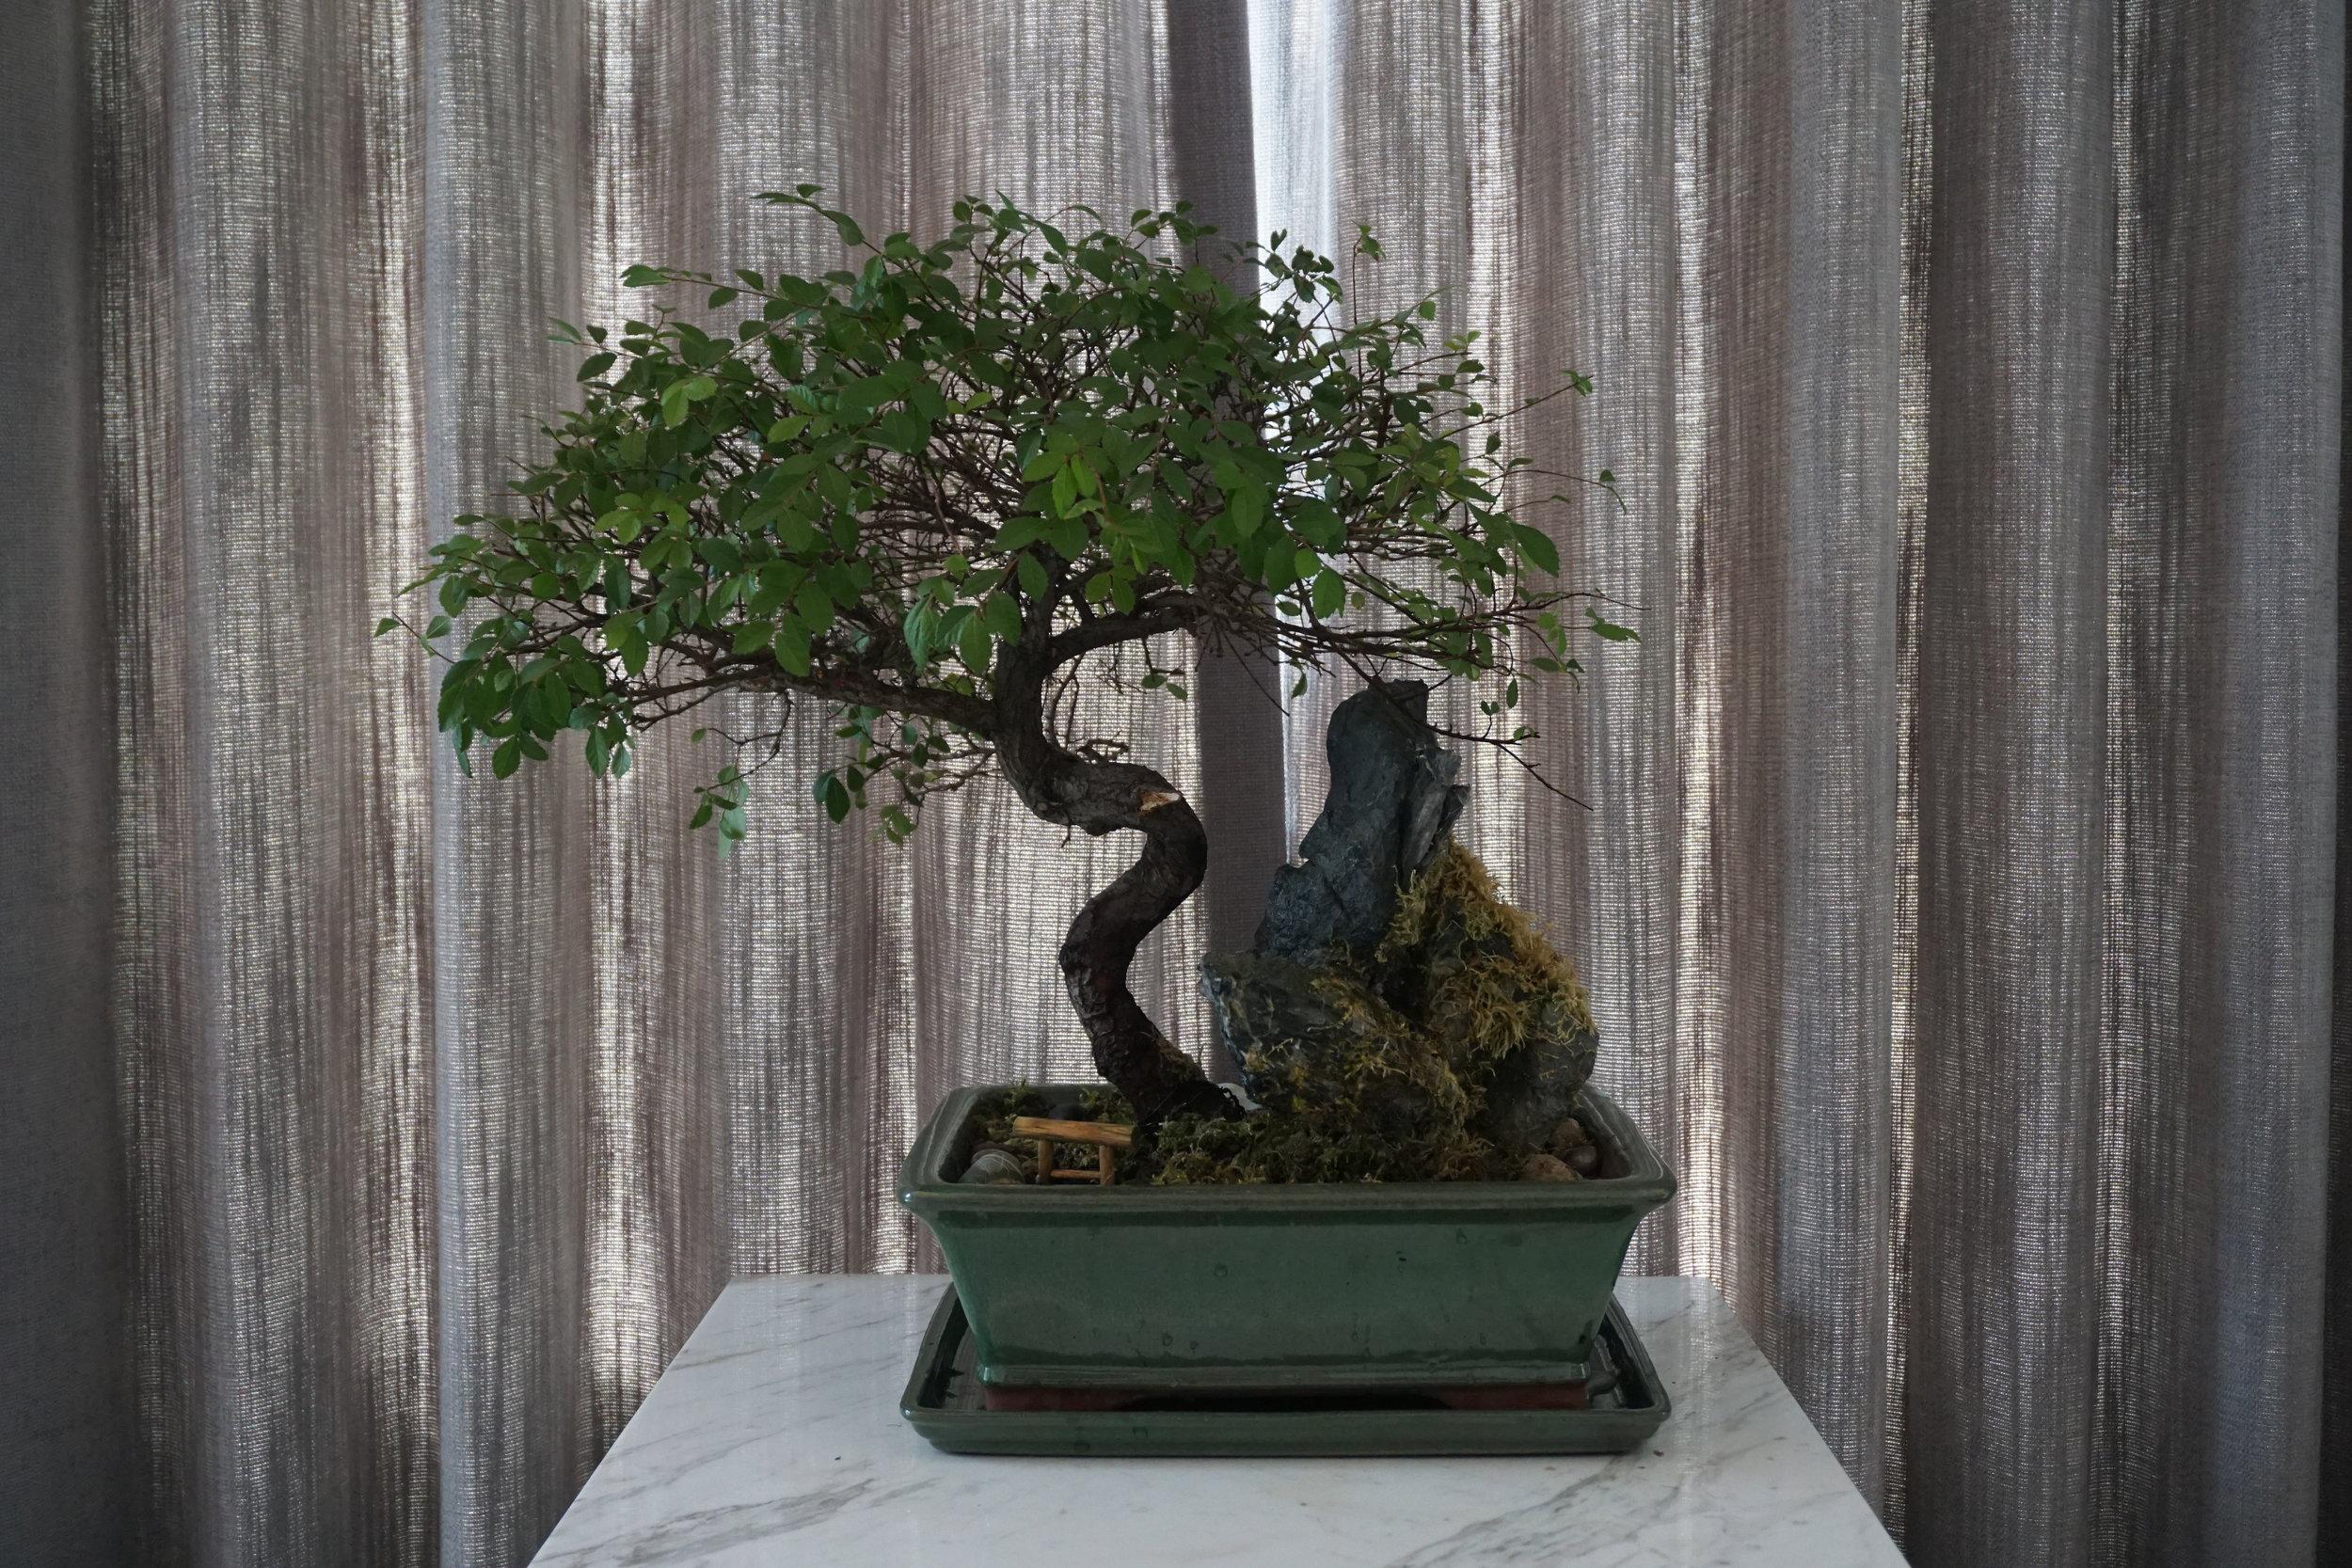 Center Bonsai after repotting